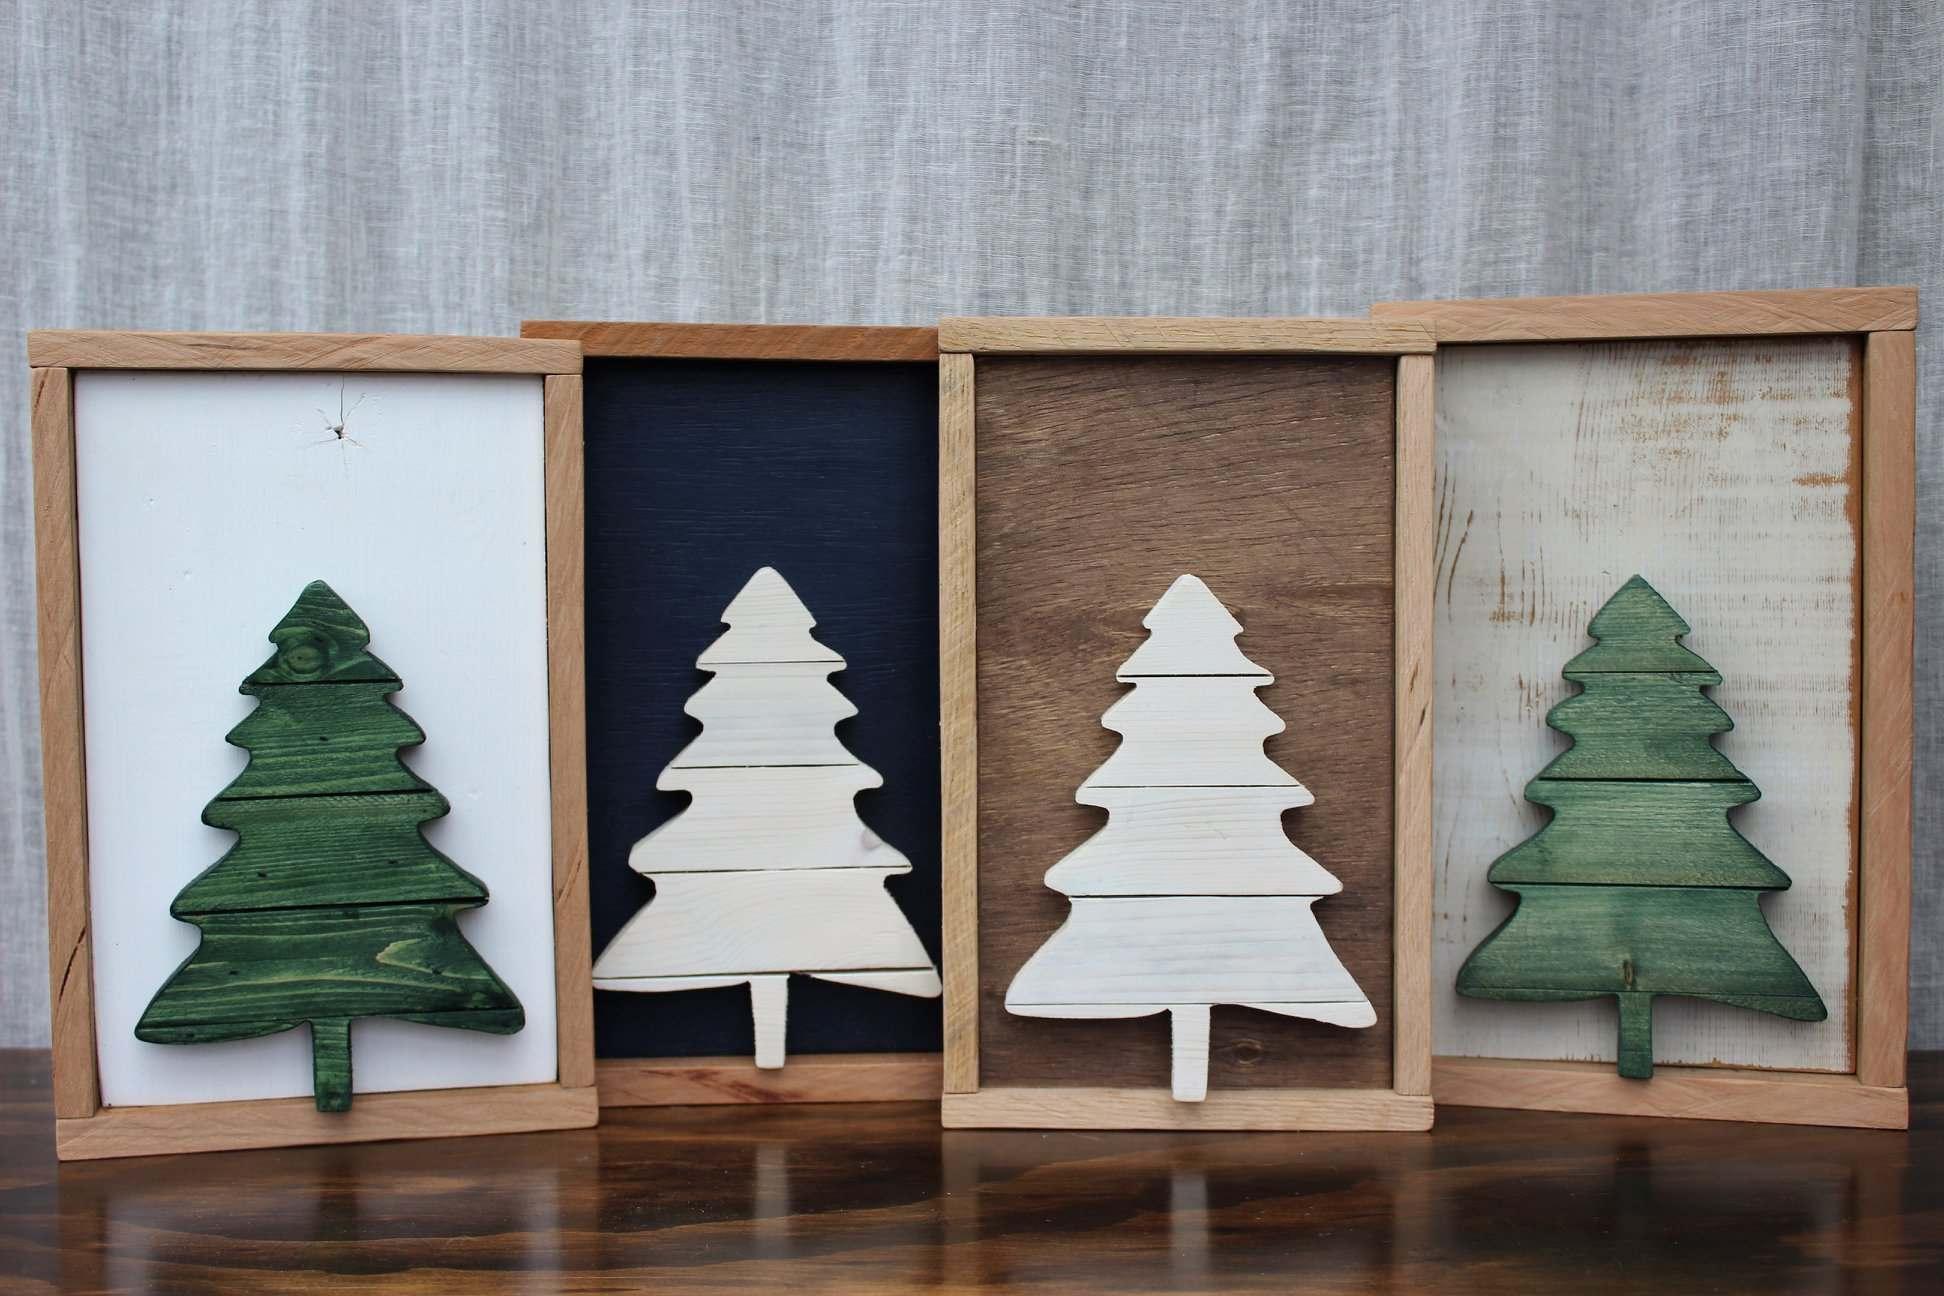 Image of Framed Trees